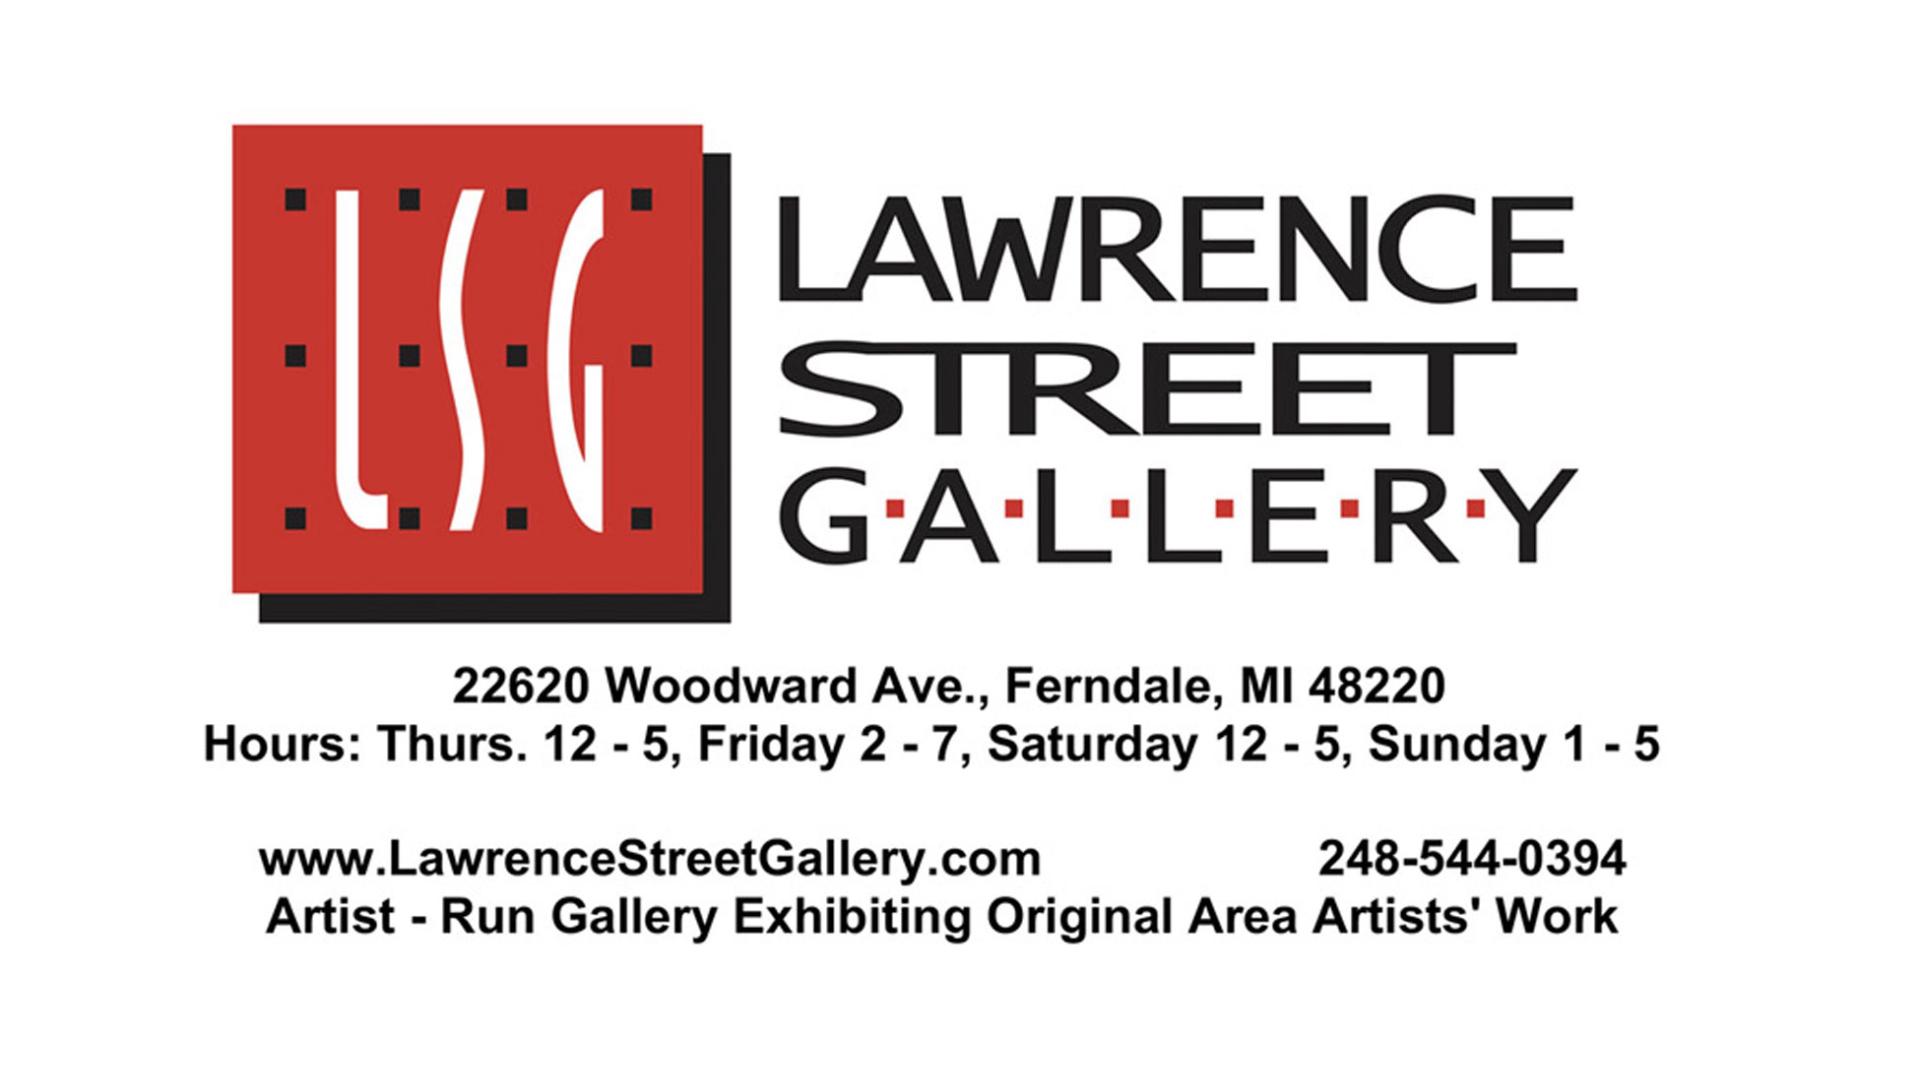 Lawrence Street Gallery